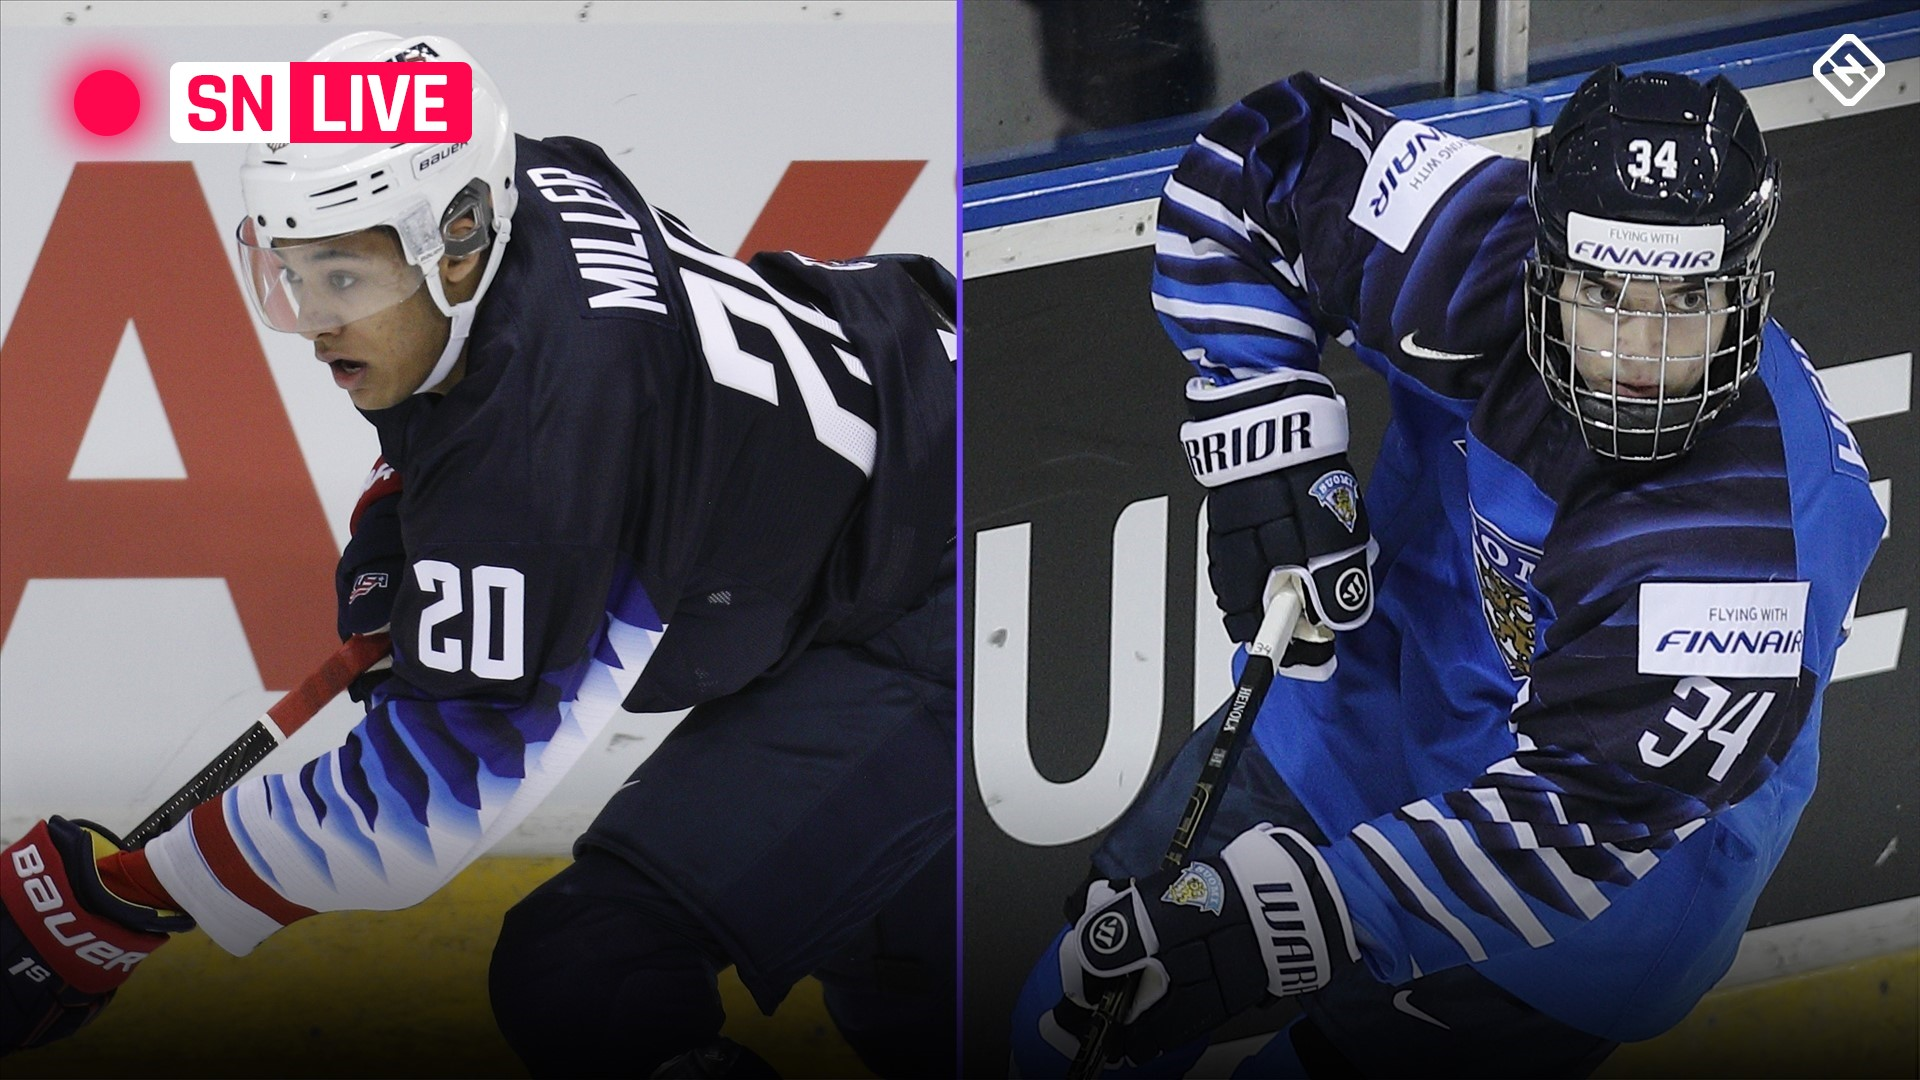 USA vs. Finland: Live score, highlights, updates from 2020 World Juniors quarterfinals